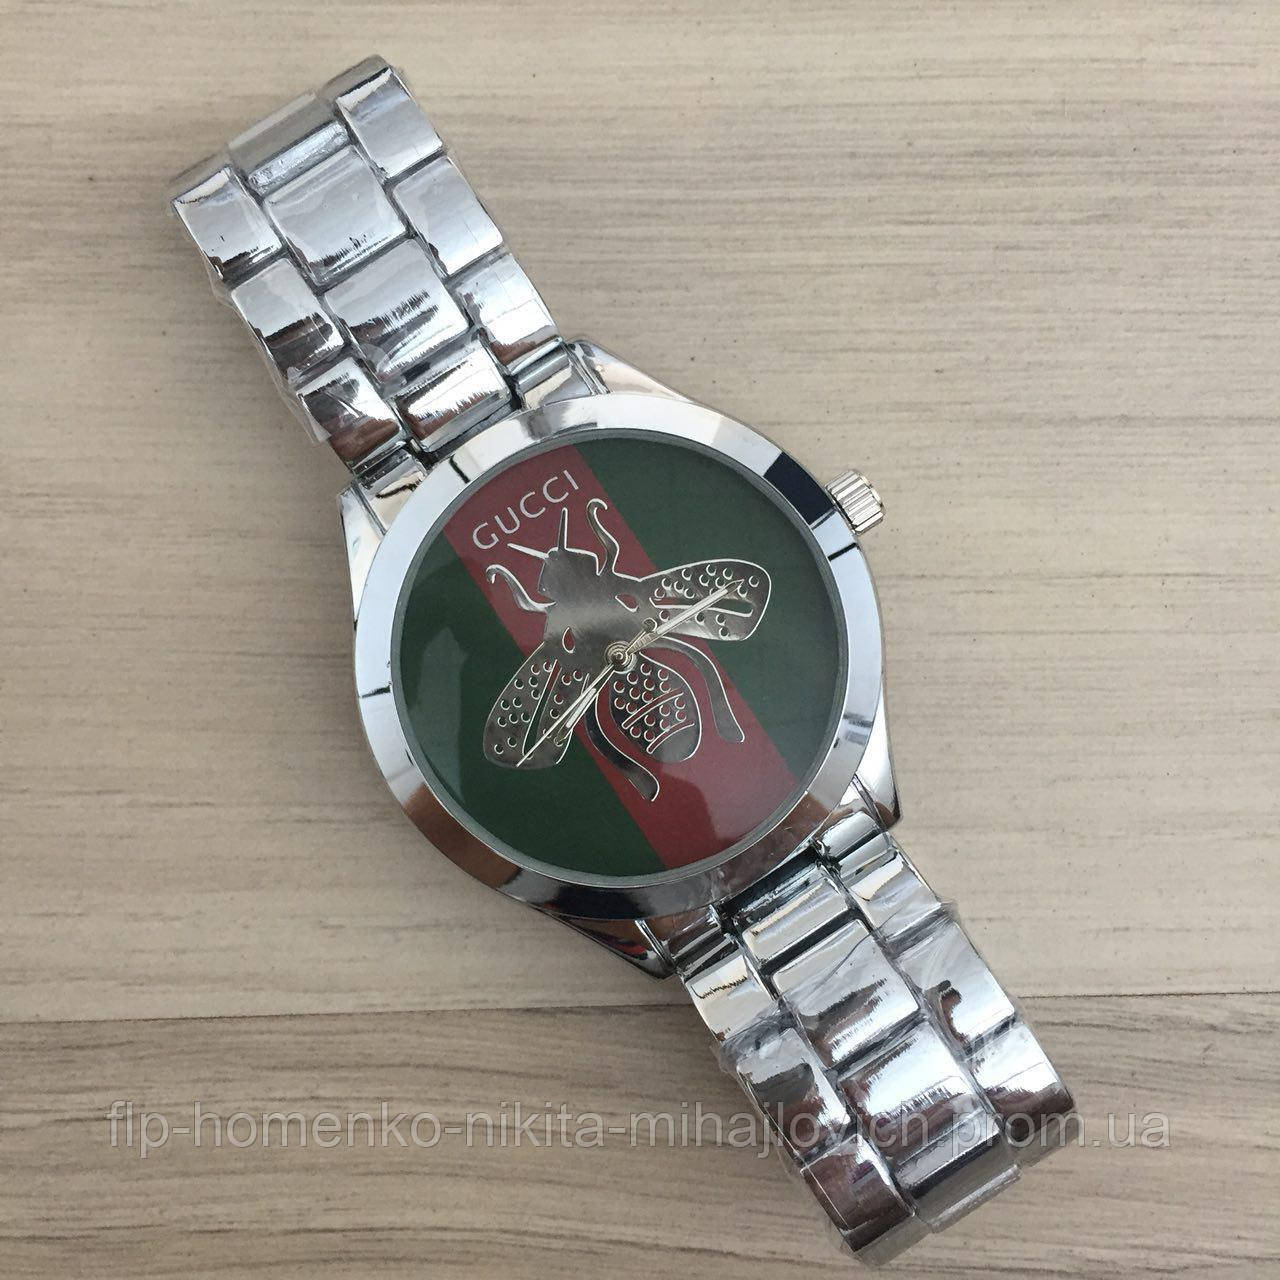 4b87ff0a Gucci 6239 Silver-Green-Red — в Категории